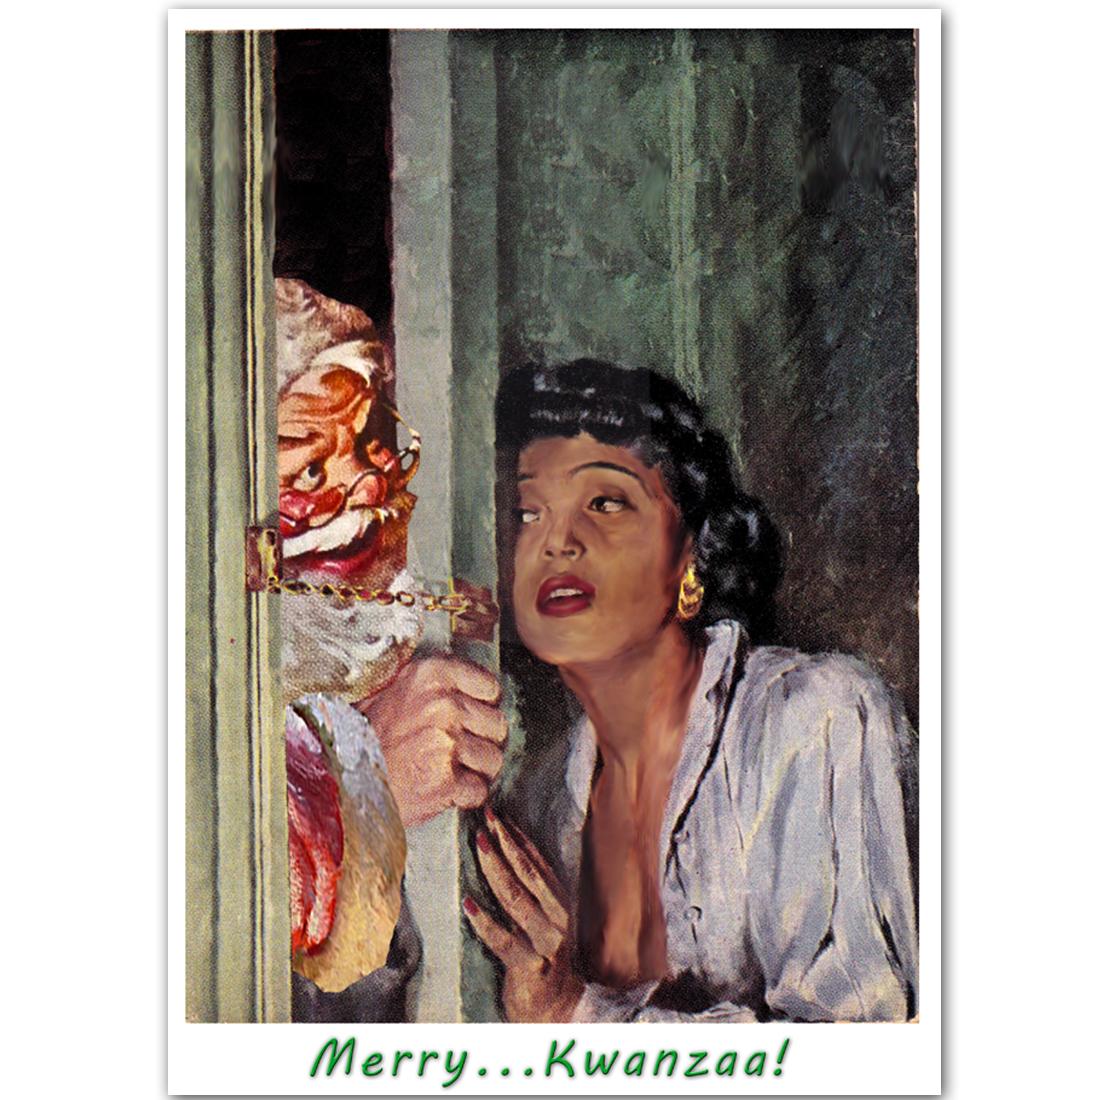 Merry... Kwanzaa!